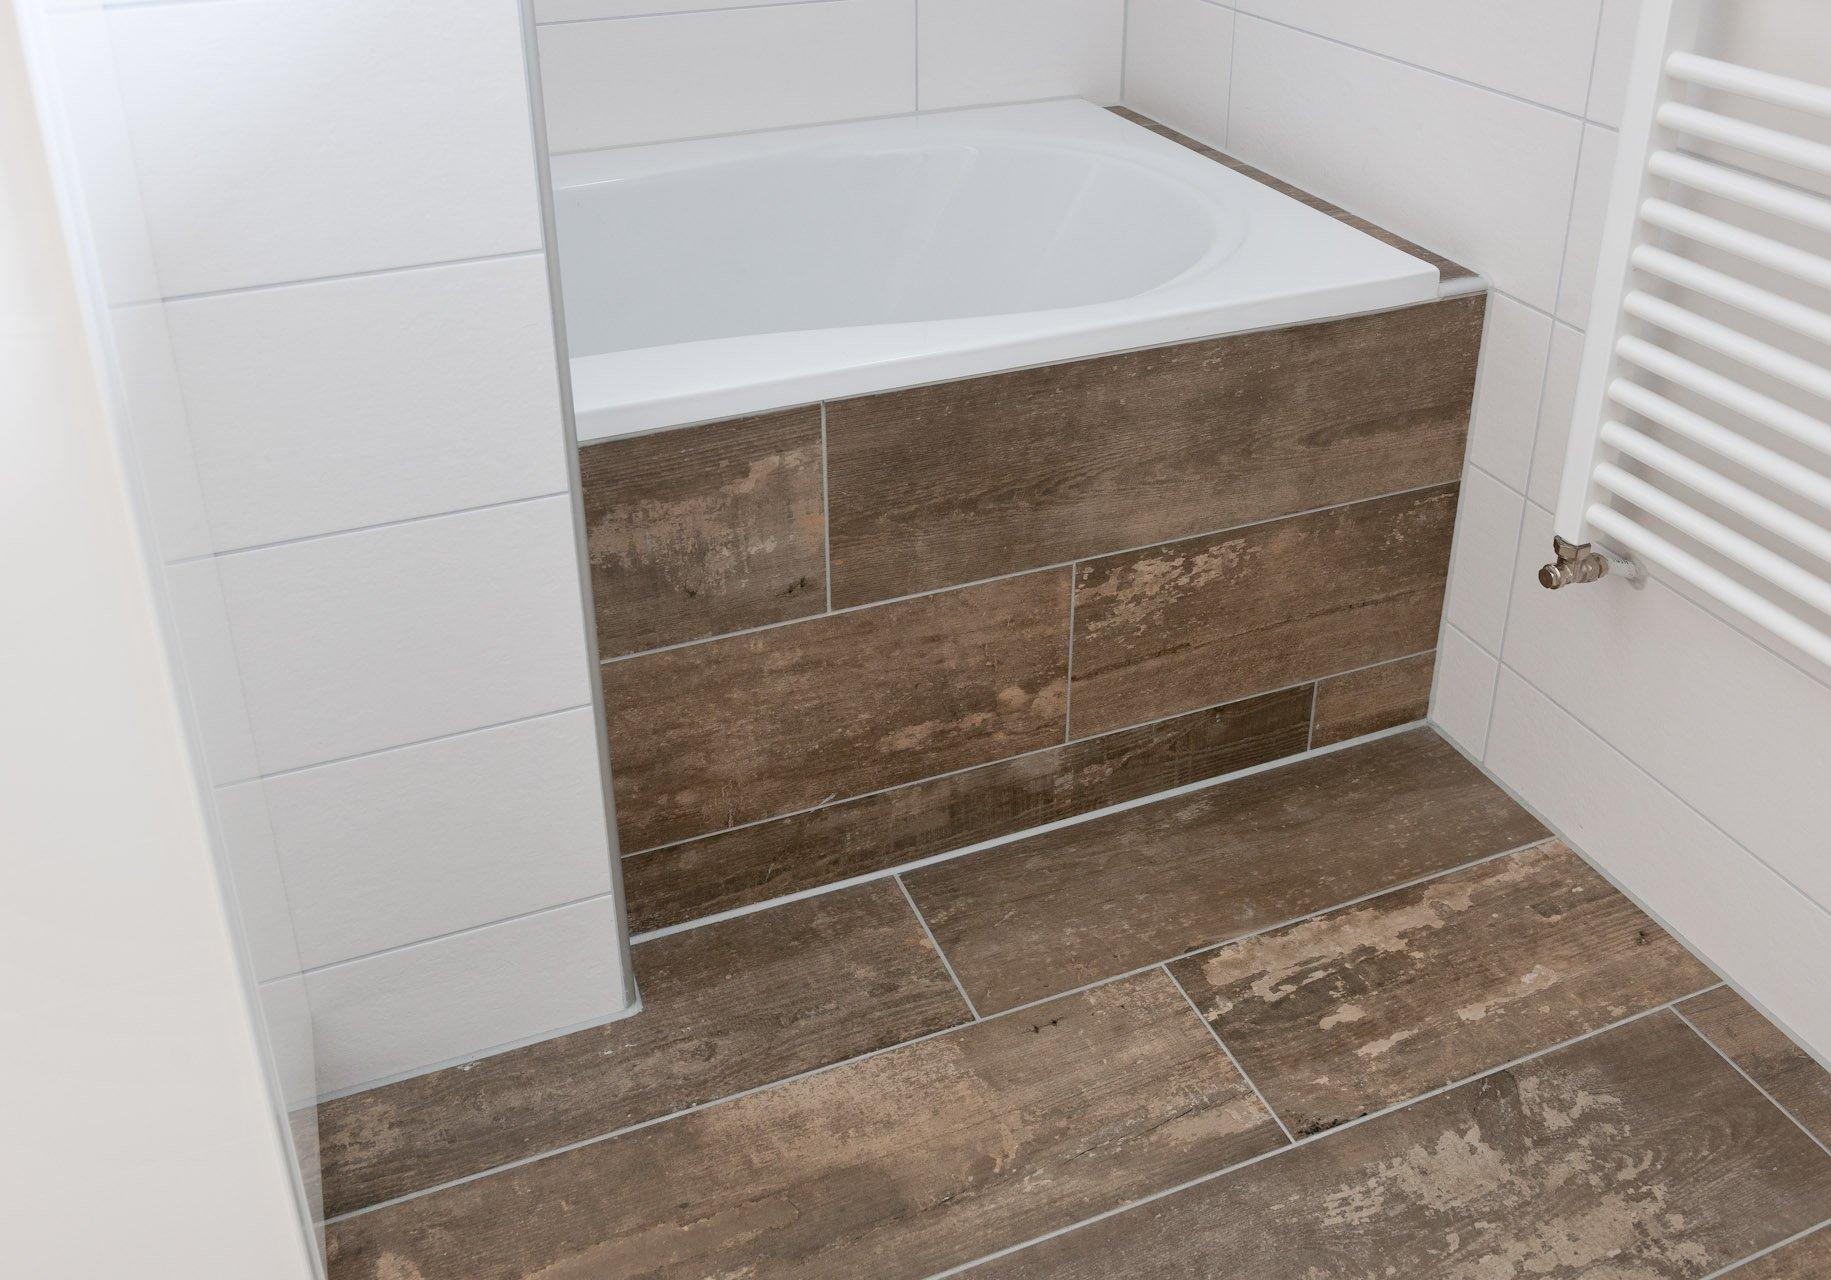 Onderkast Badkamer Maken ~ Wandtegels badkamer  KROON vloer in Steen